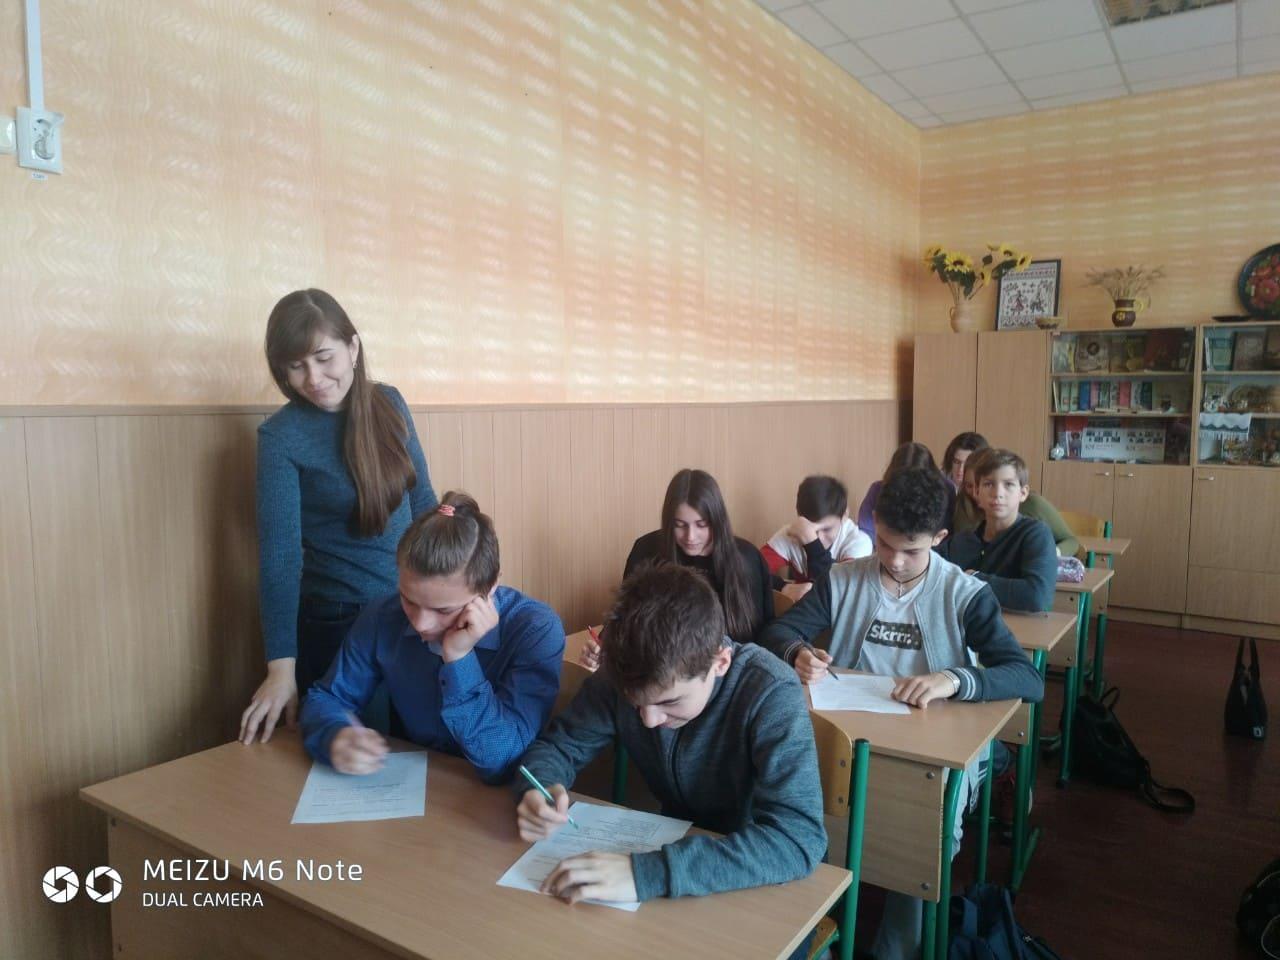 http://kharkivschool3.at.ua/IMG-159db3a16bcdfa3c8e08fe6a31d61074-V.jpg